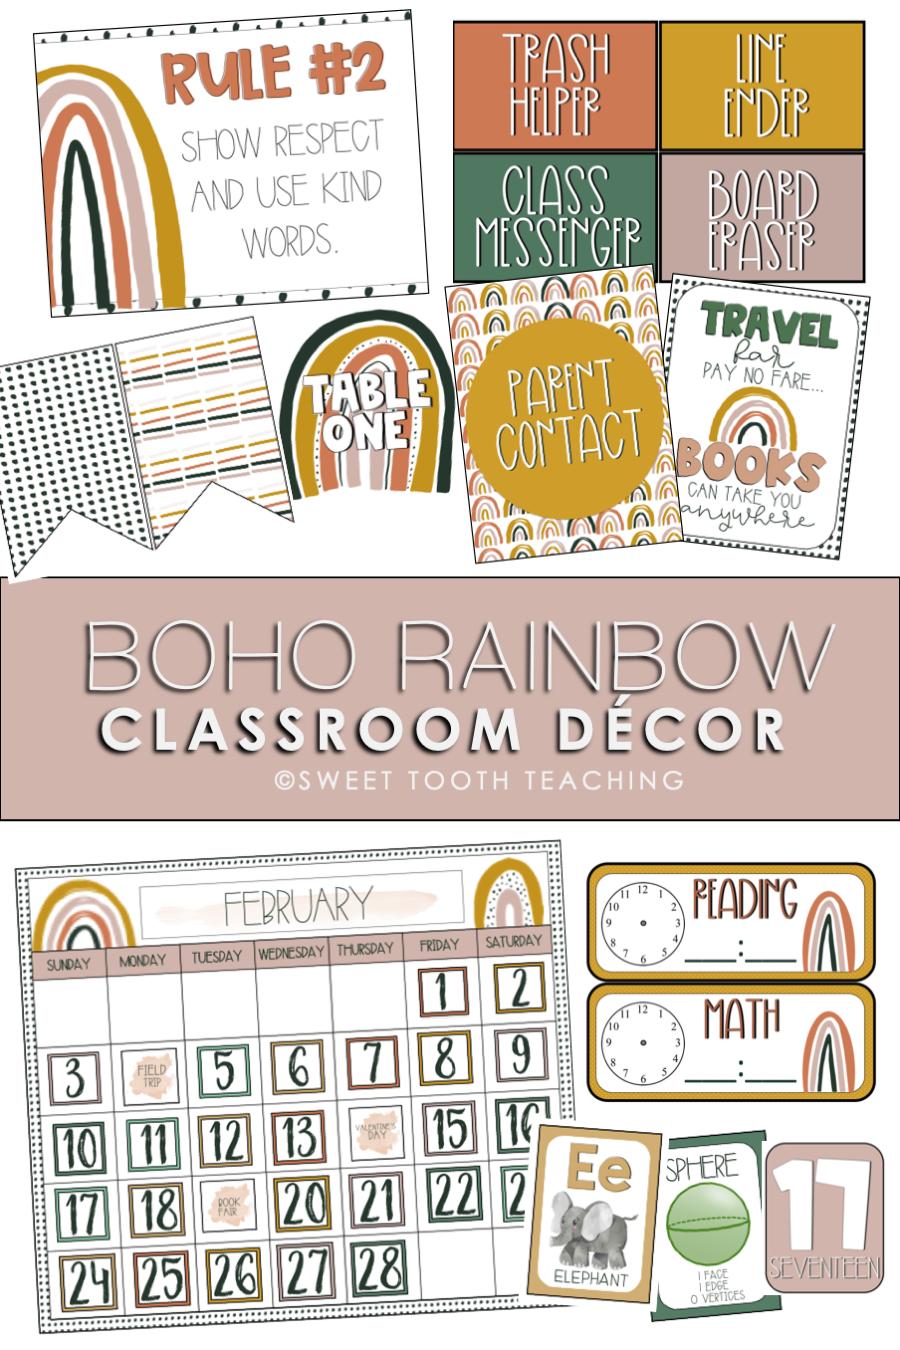 Boho Rainbow Classroom Decor Neutral Colors In 2020 Classroom Decor Classroom Classroom Calendar